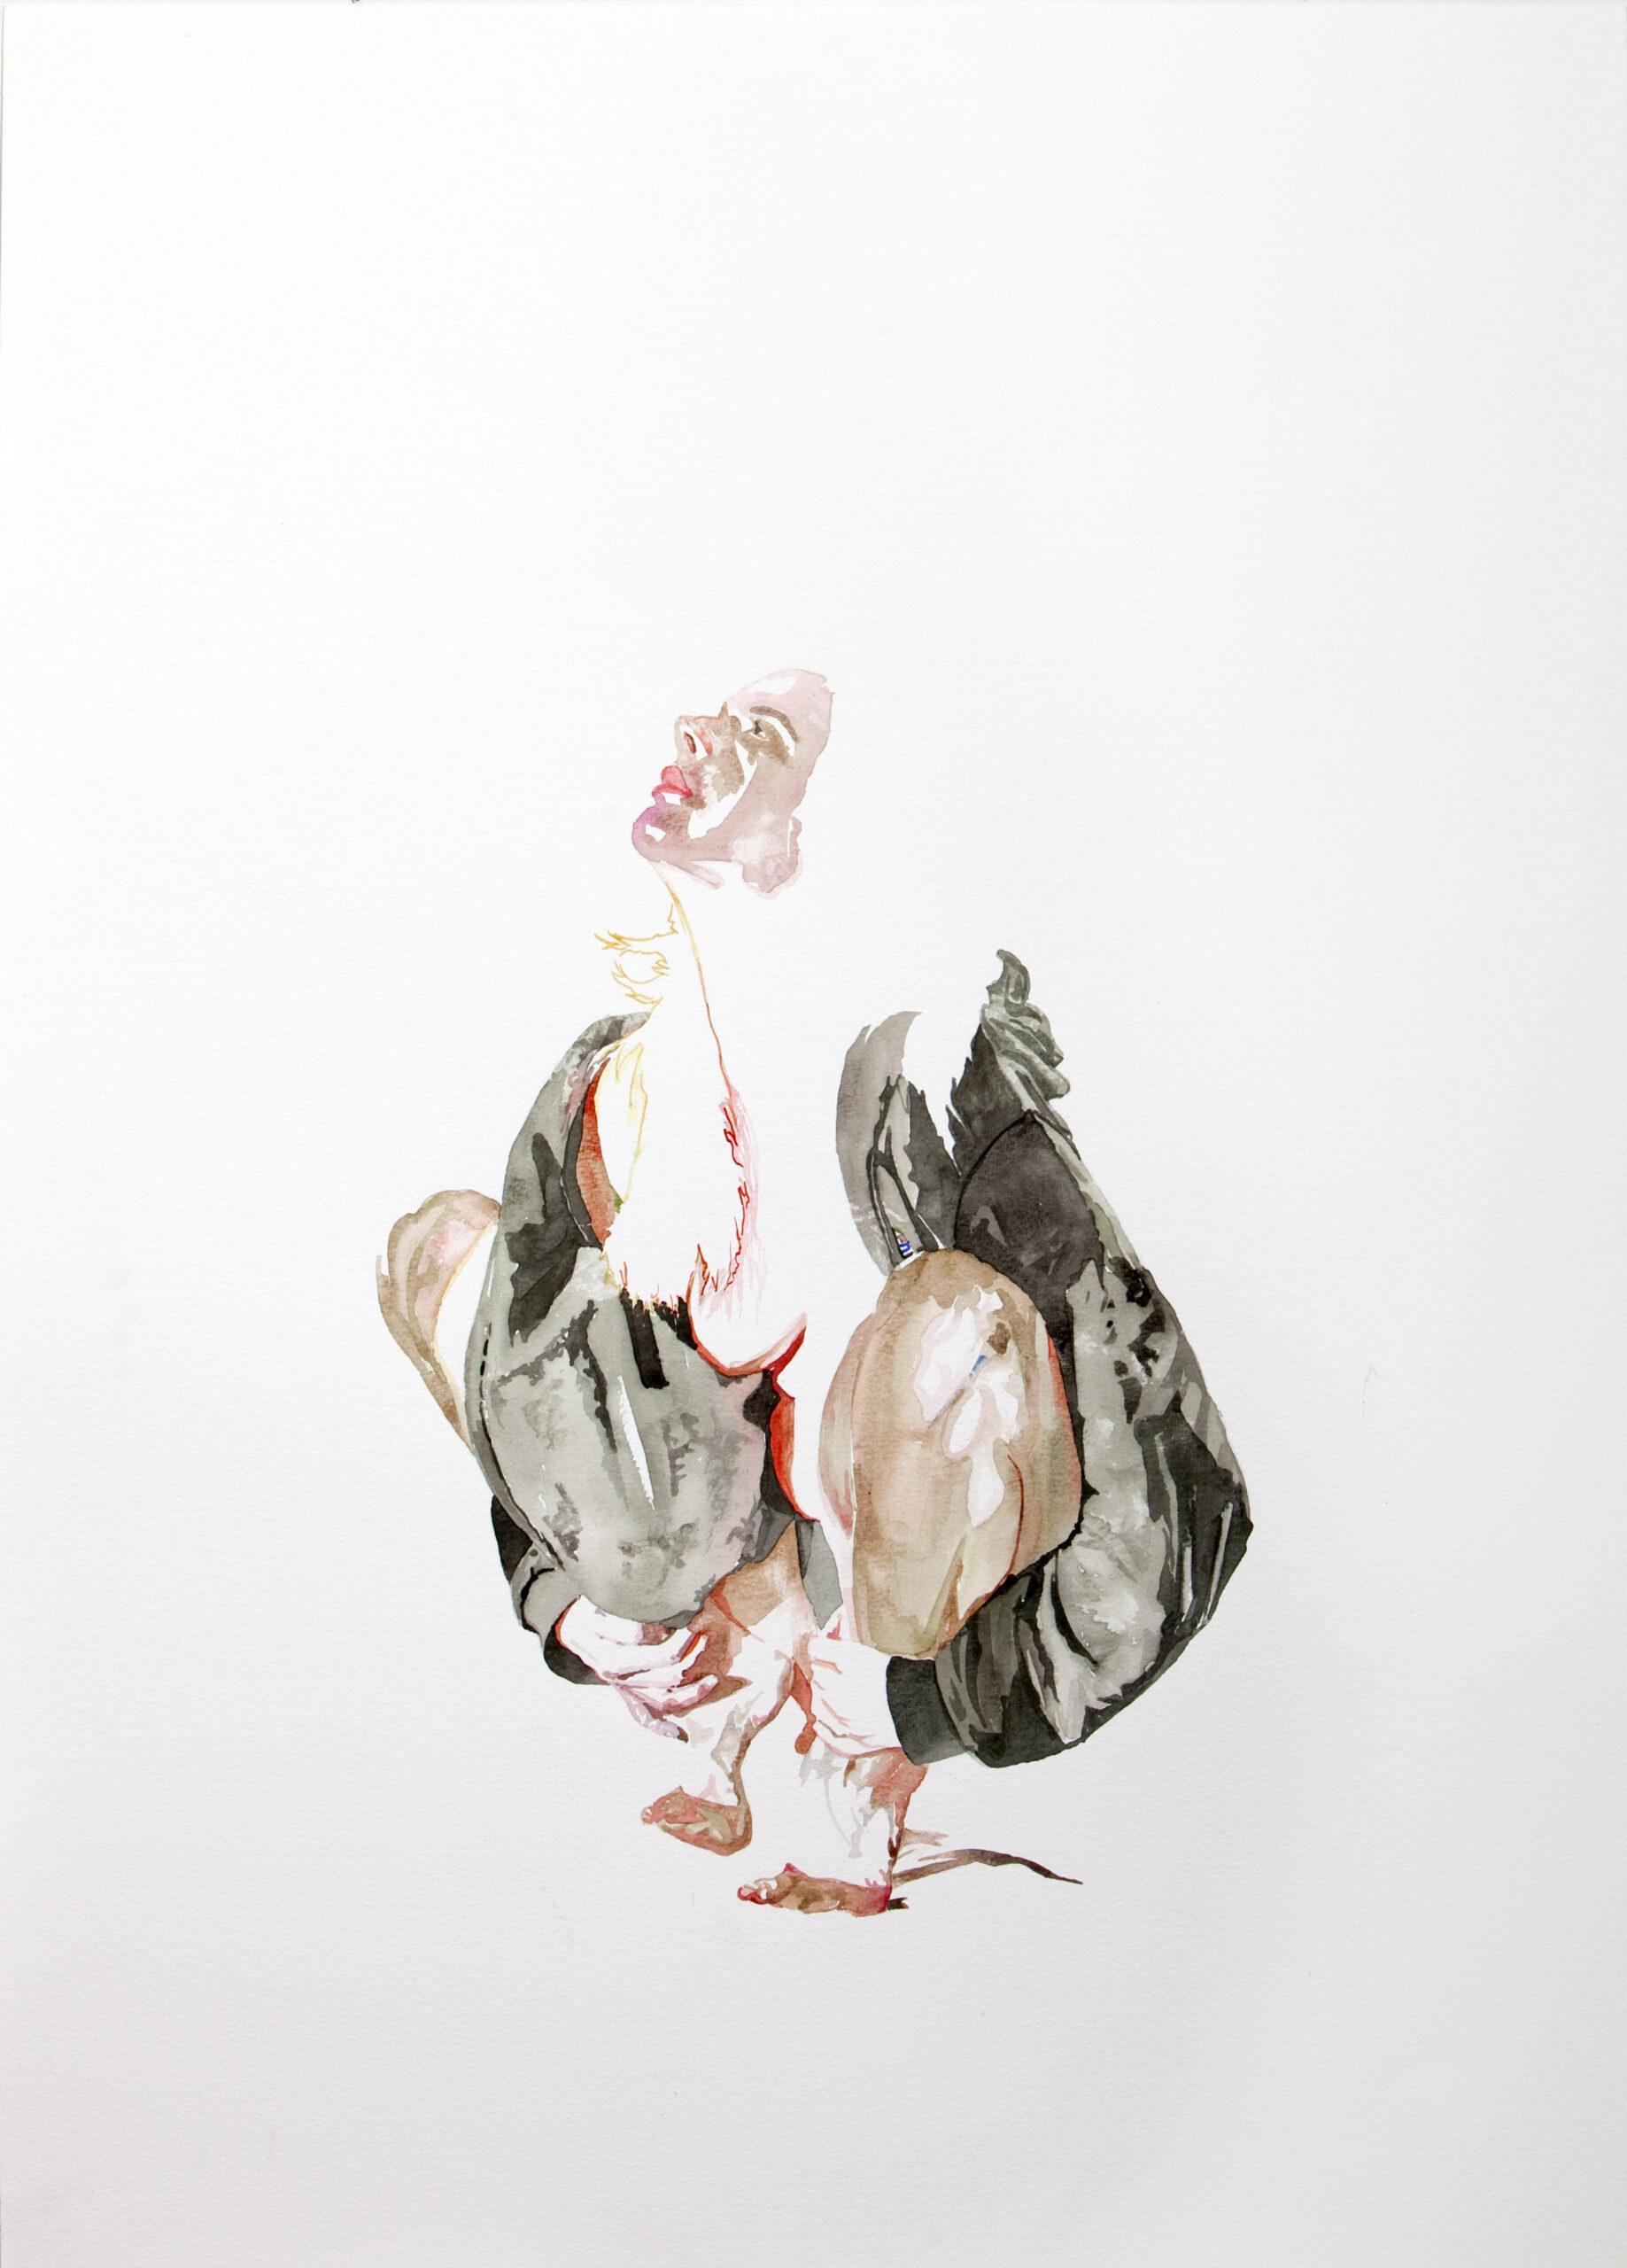 Wouter van de Koot drawing watercolour woman crouching light naked